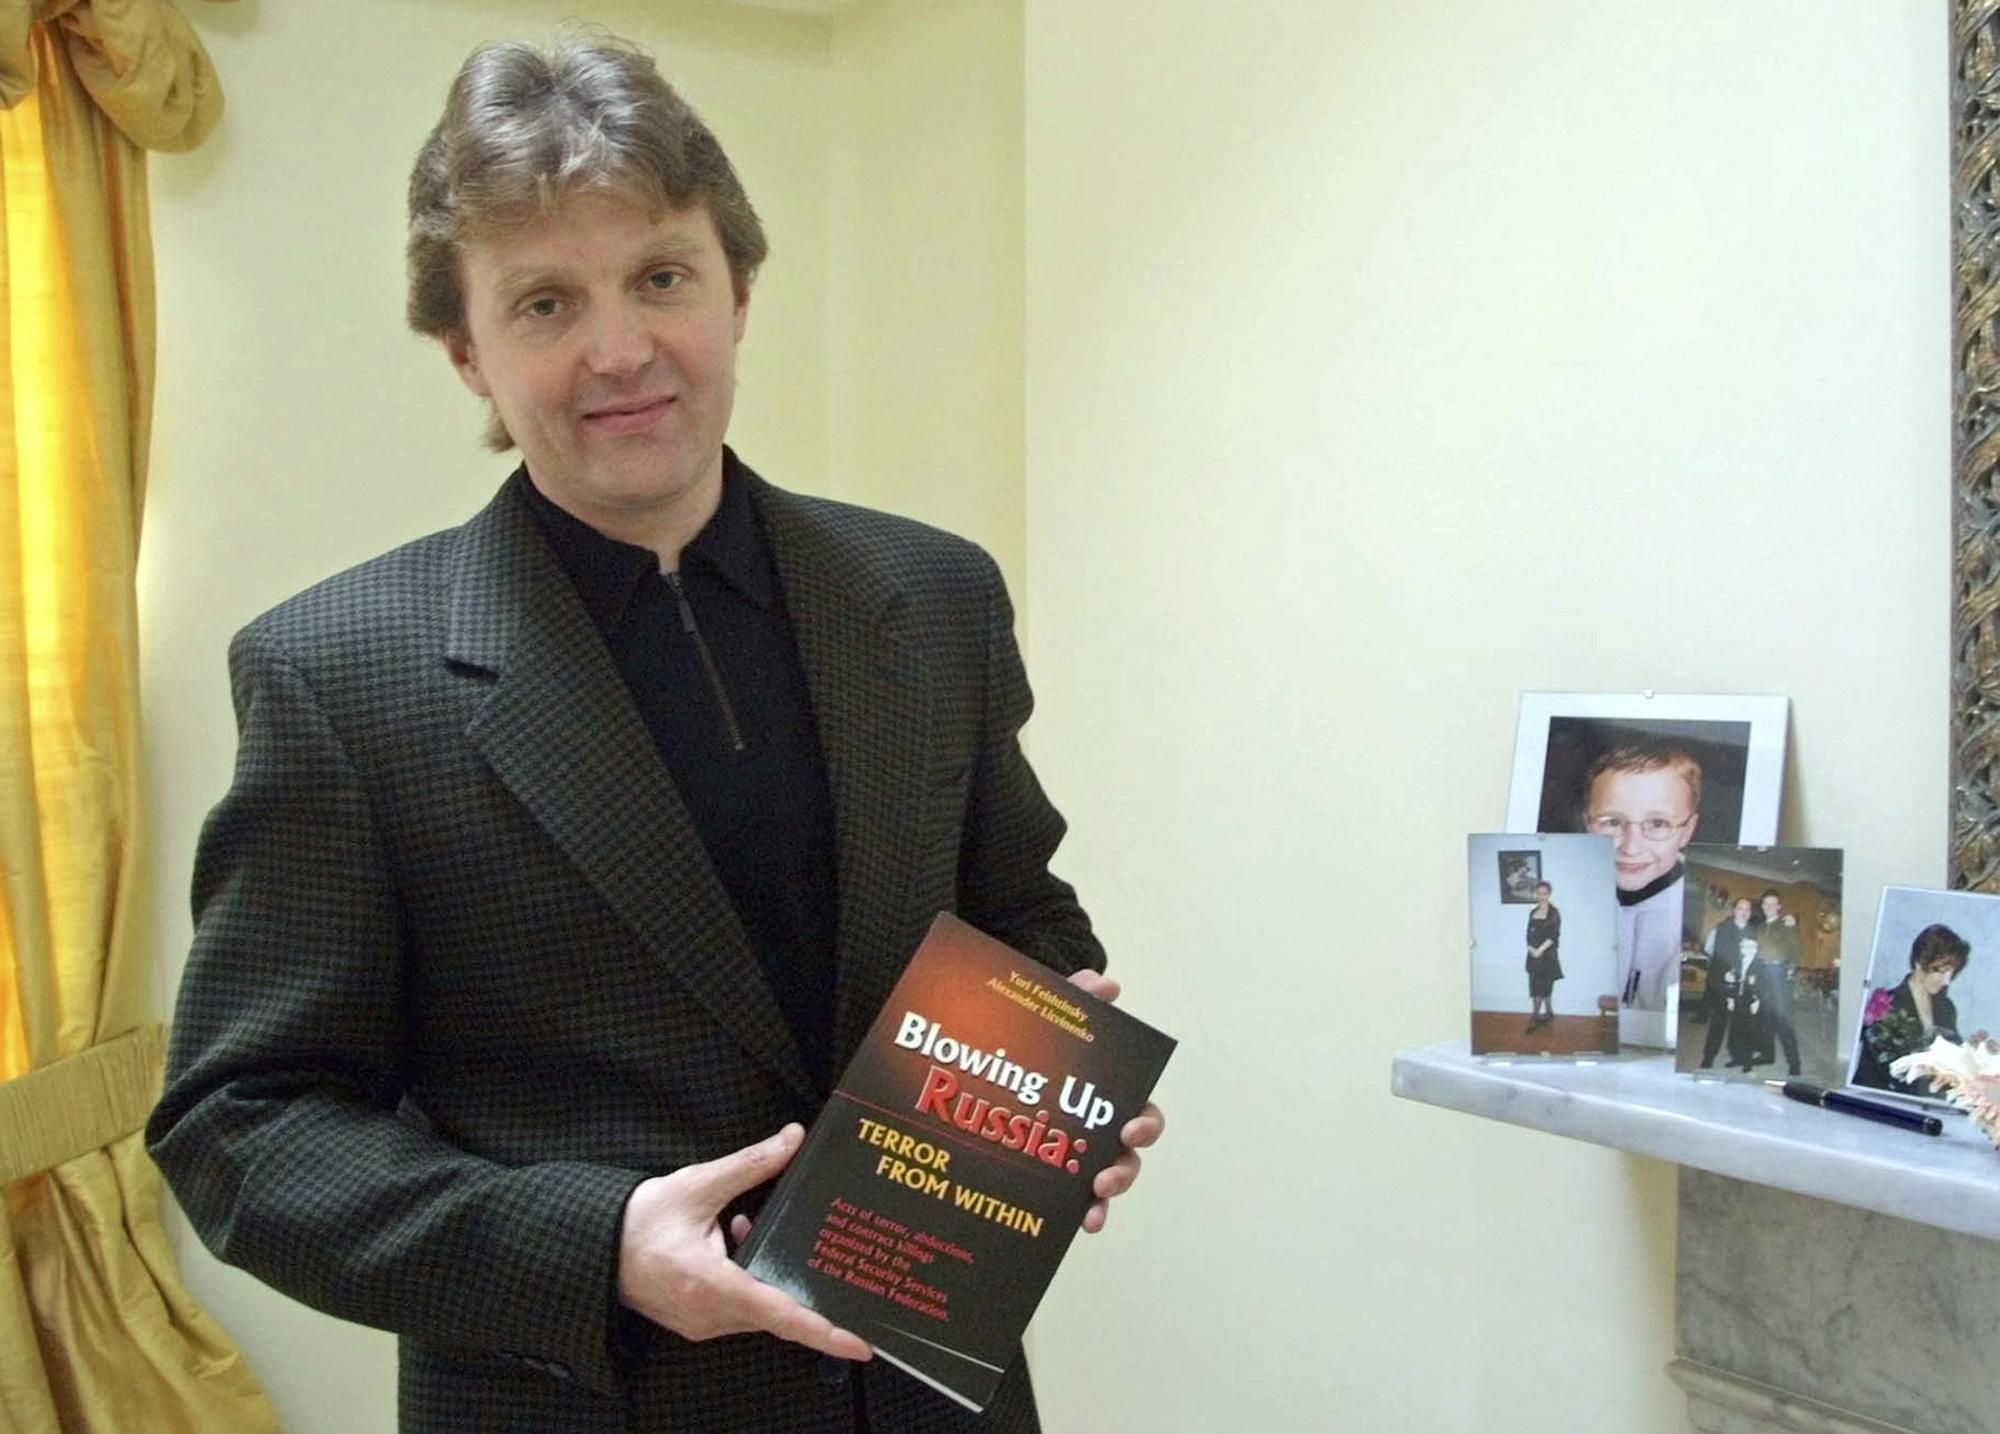 Alexander Litvinenko